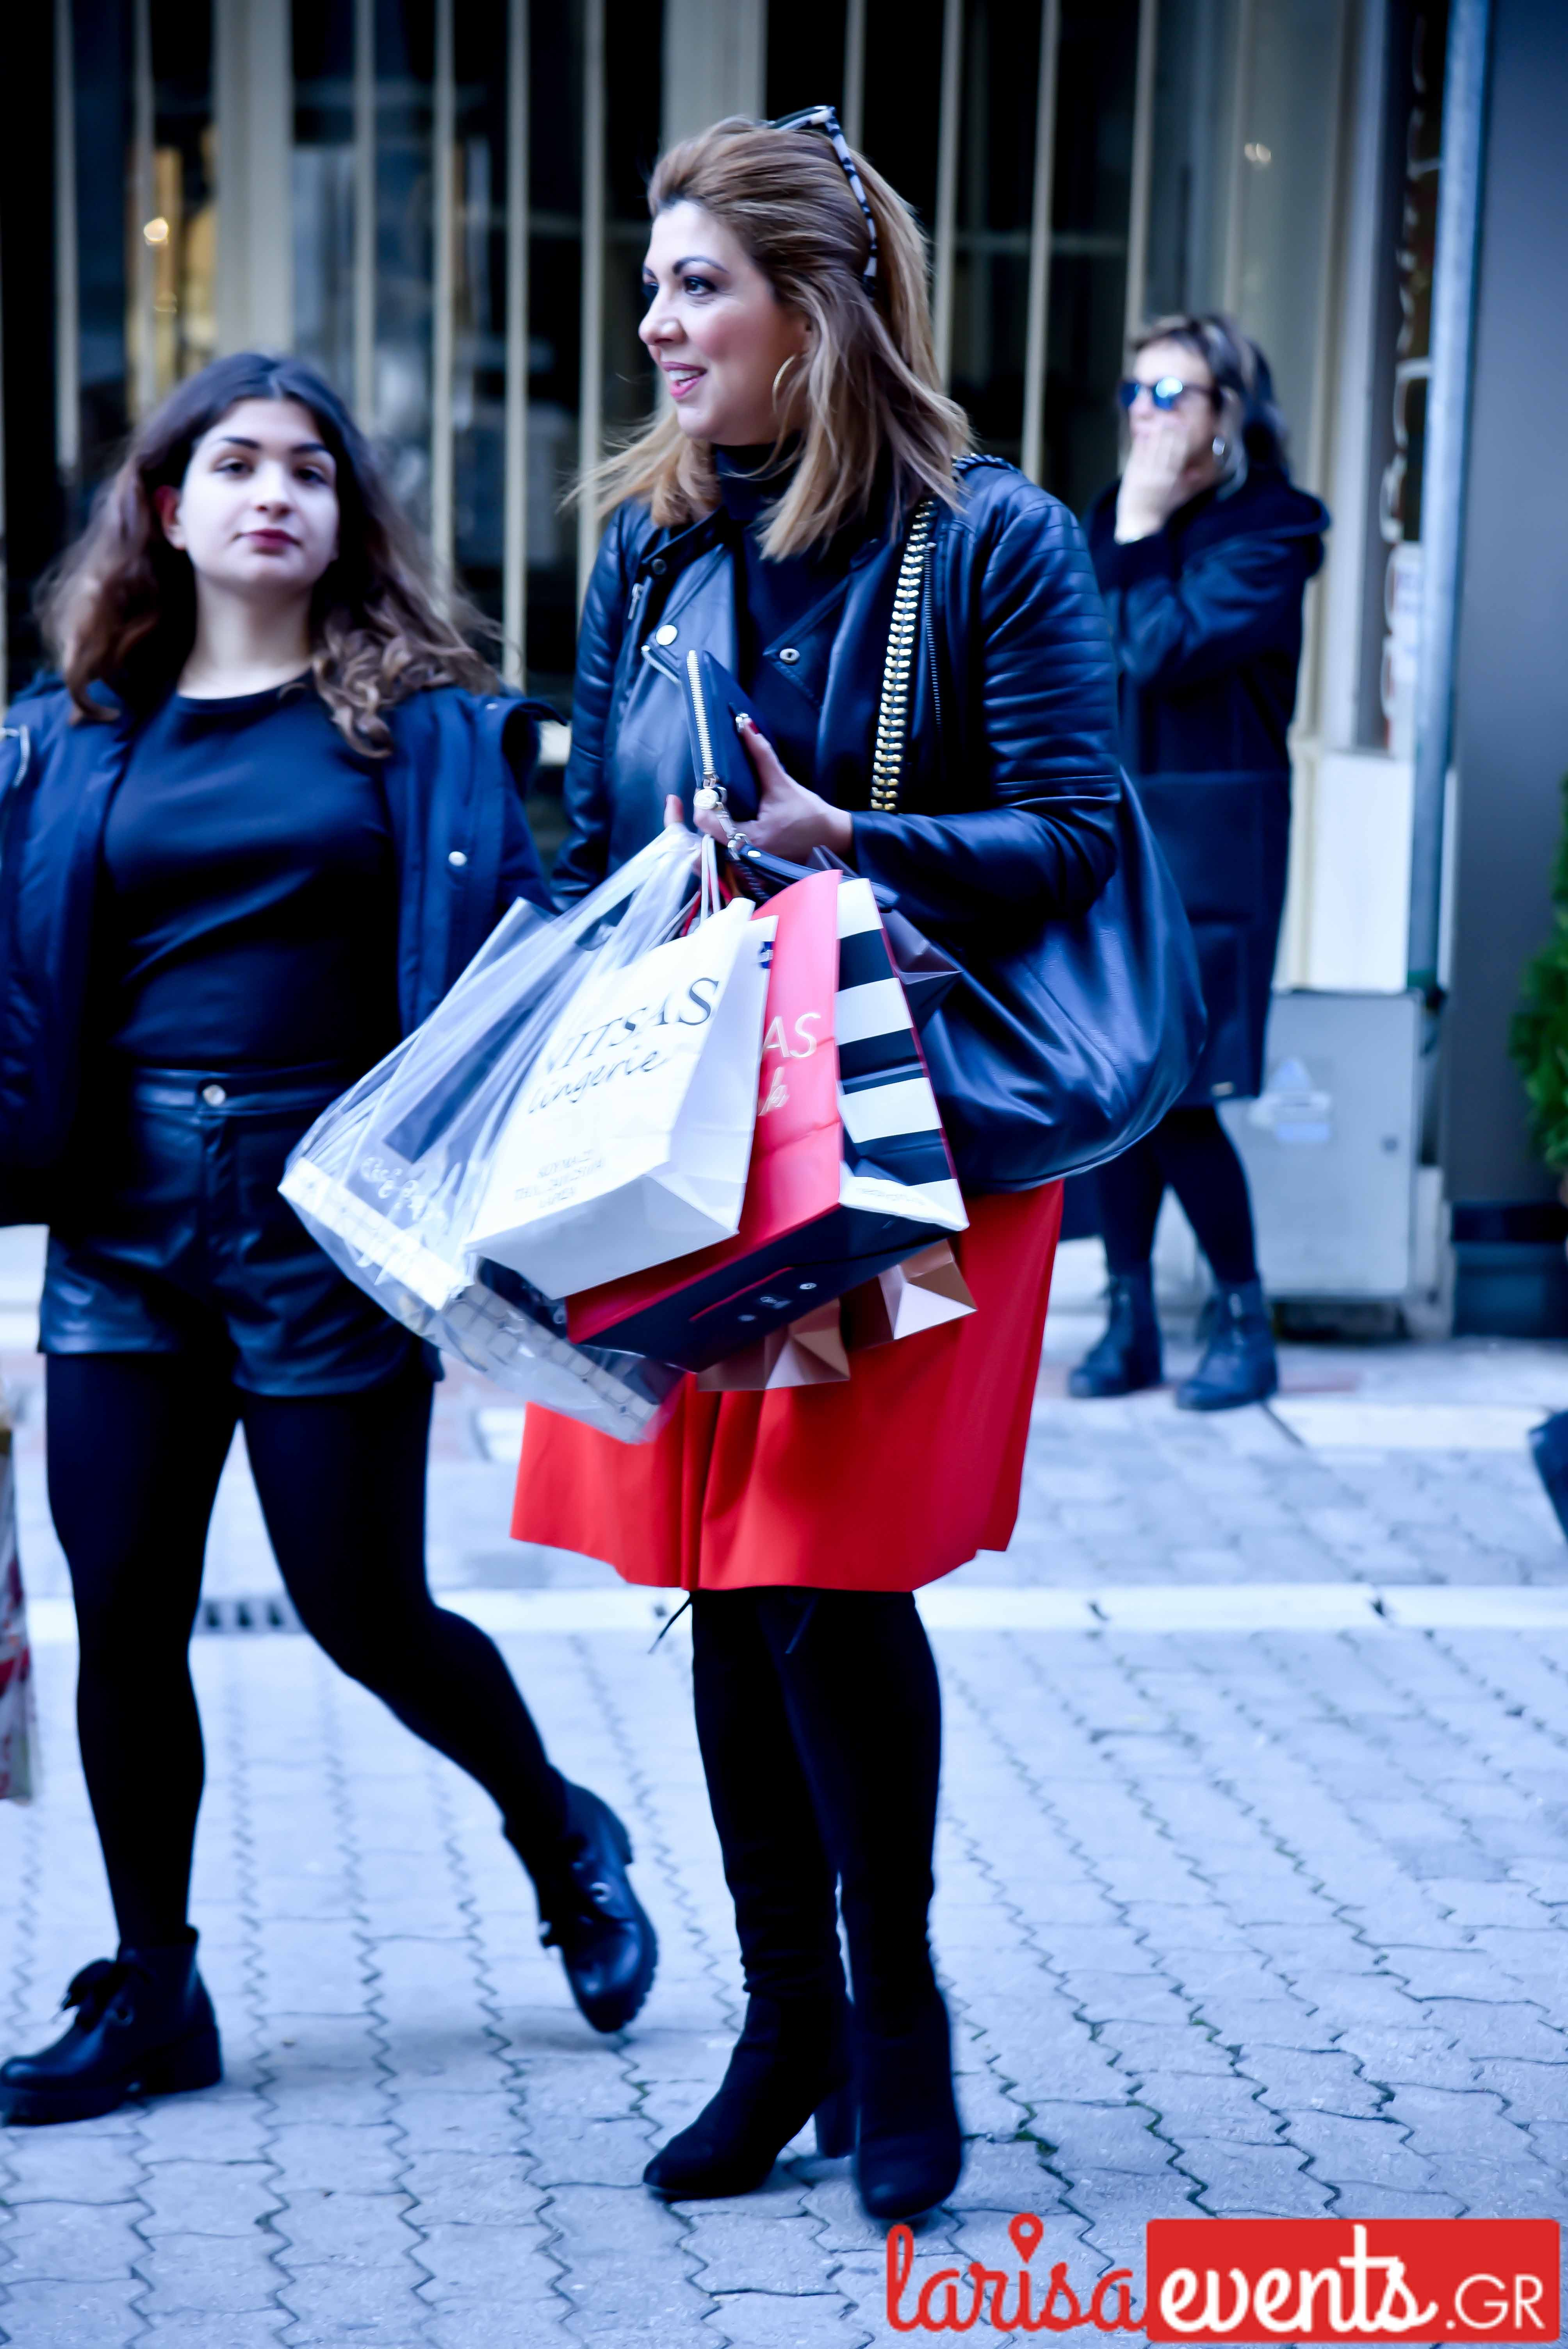 LAZ 7304 - Λάρισα's Street Style | Οι γυναίκες της πόλης σε street style clicks!